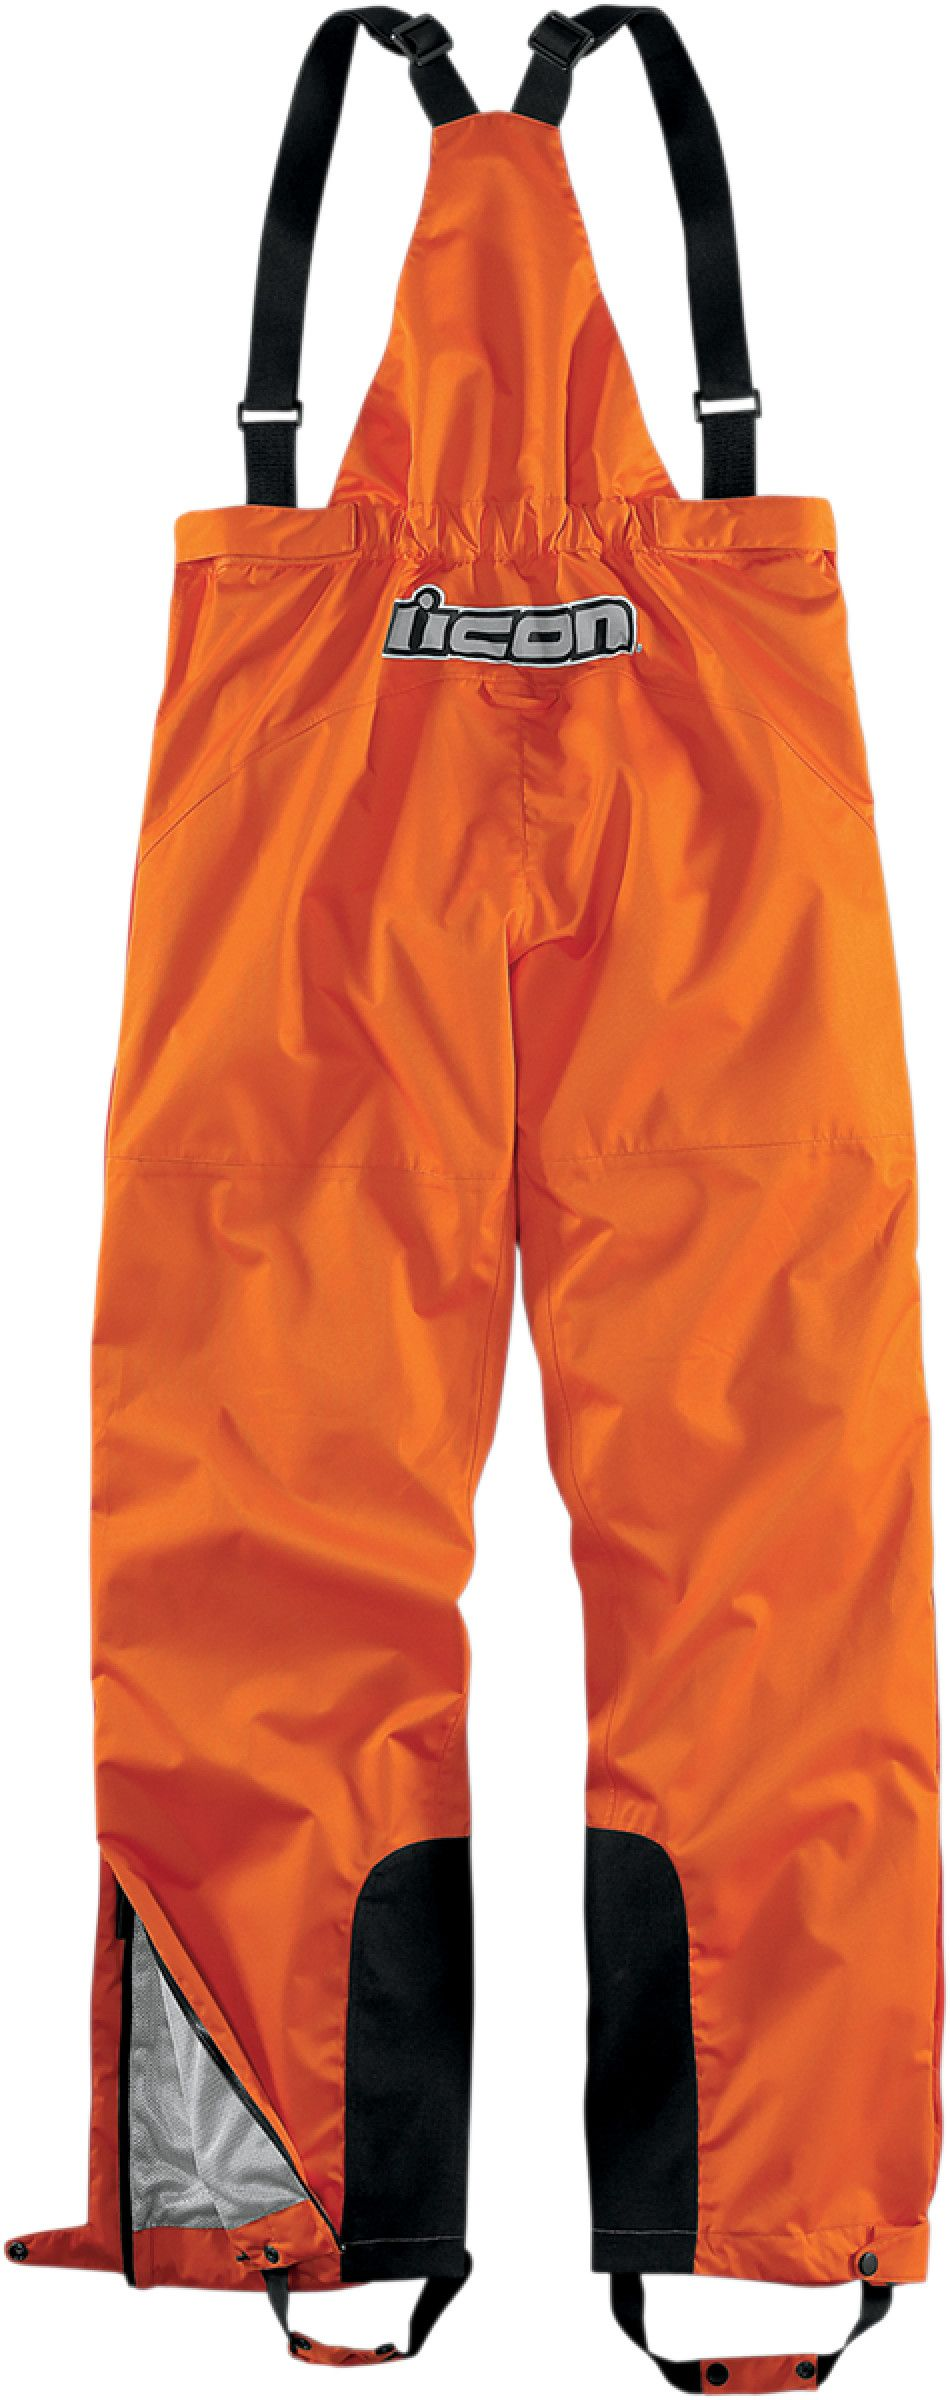 【ICON】吊帶褲 BIB PDX HI-VIZ ORANGE - 「Webike-摩托百貨」